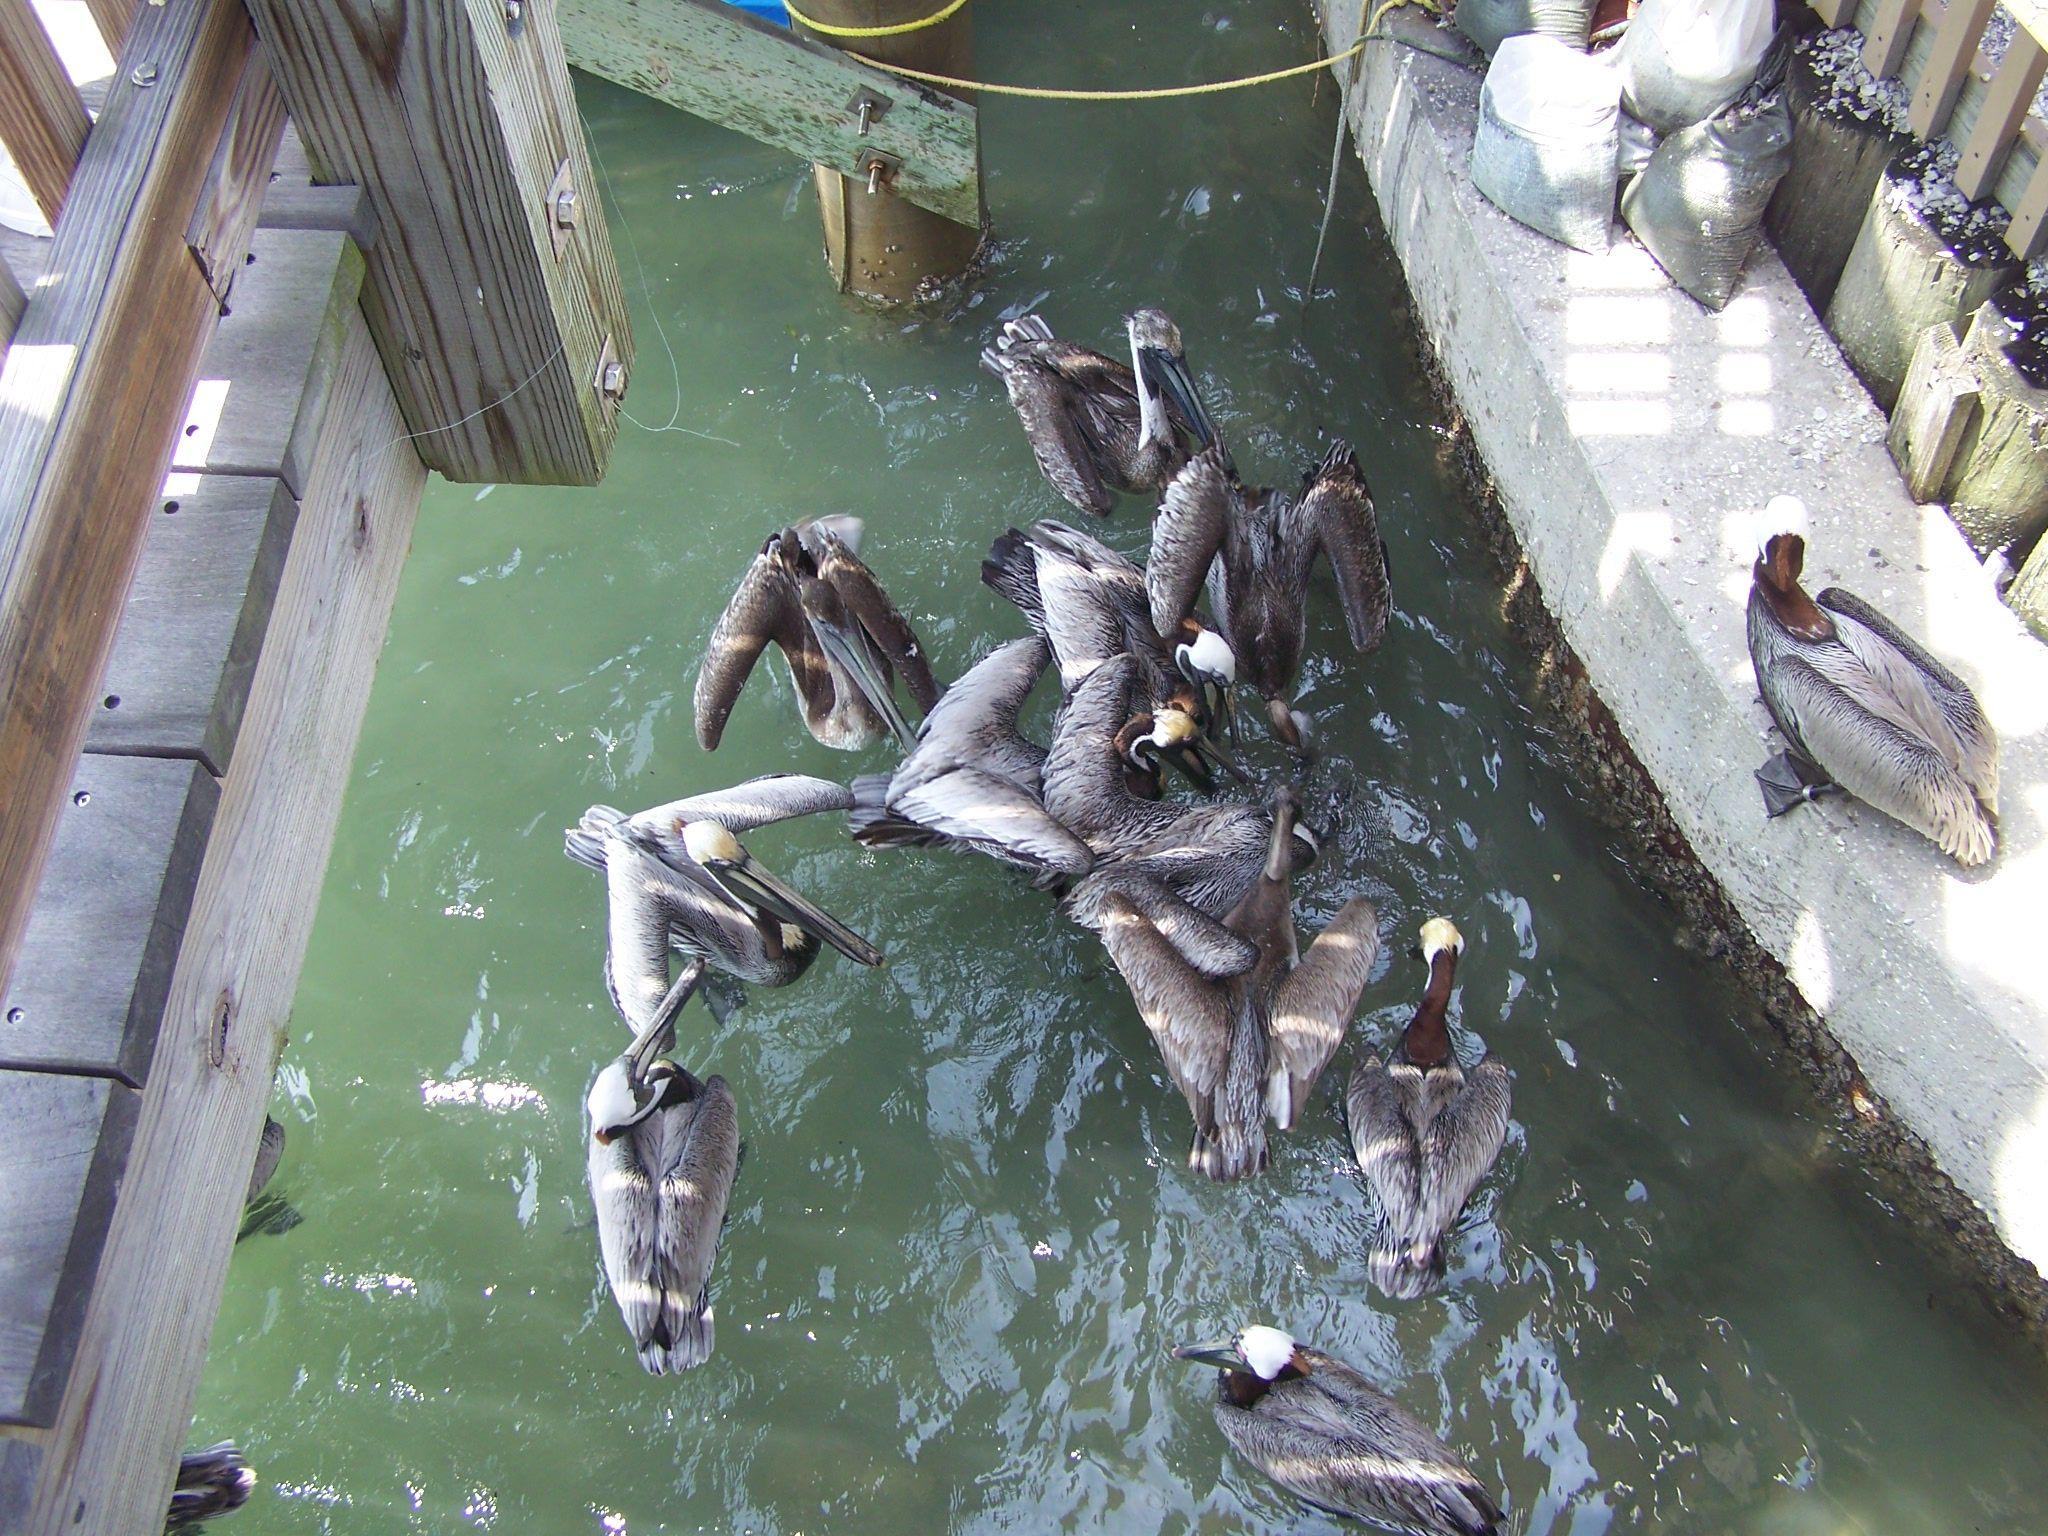 Pelicans enjoying fish scraps